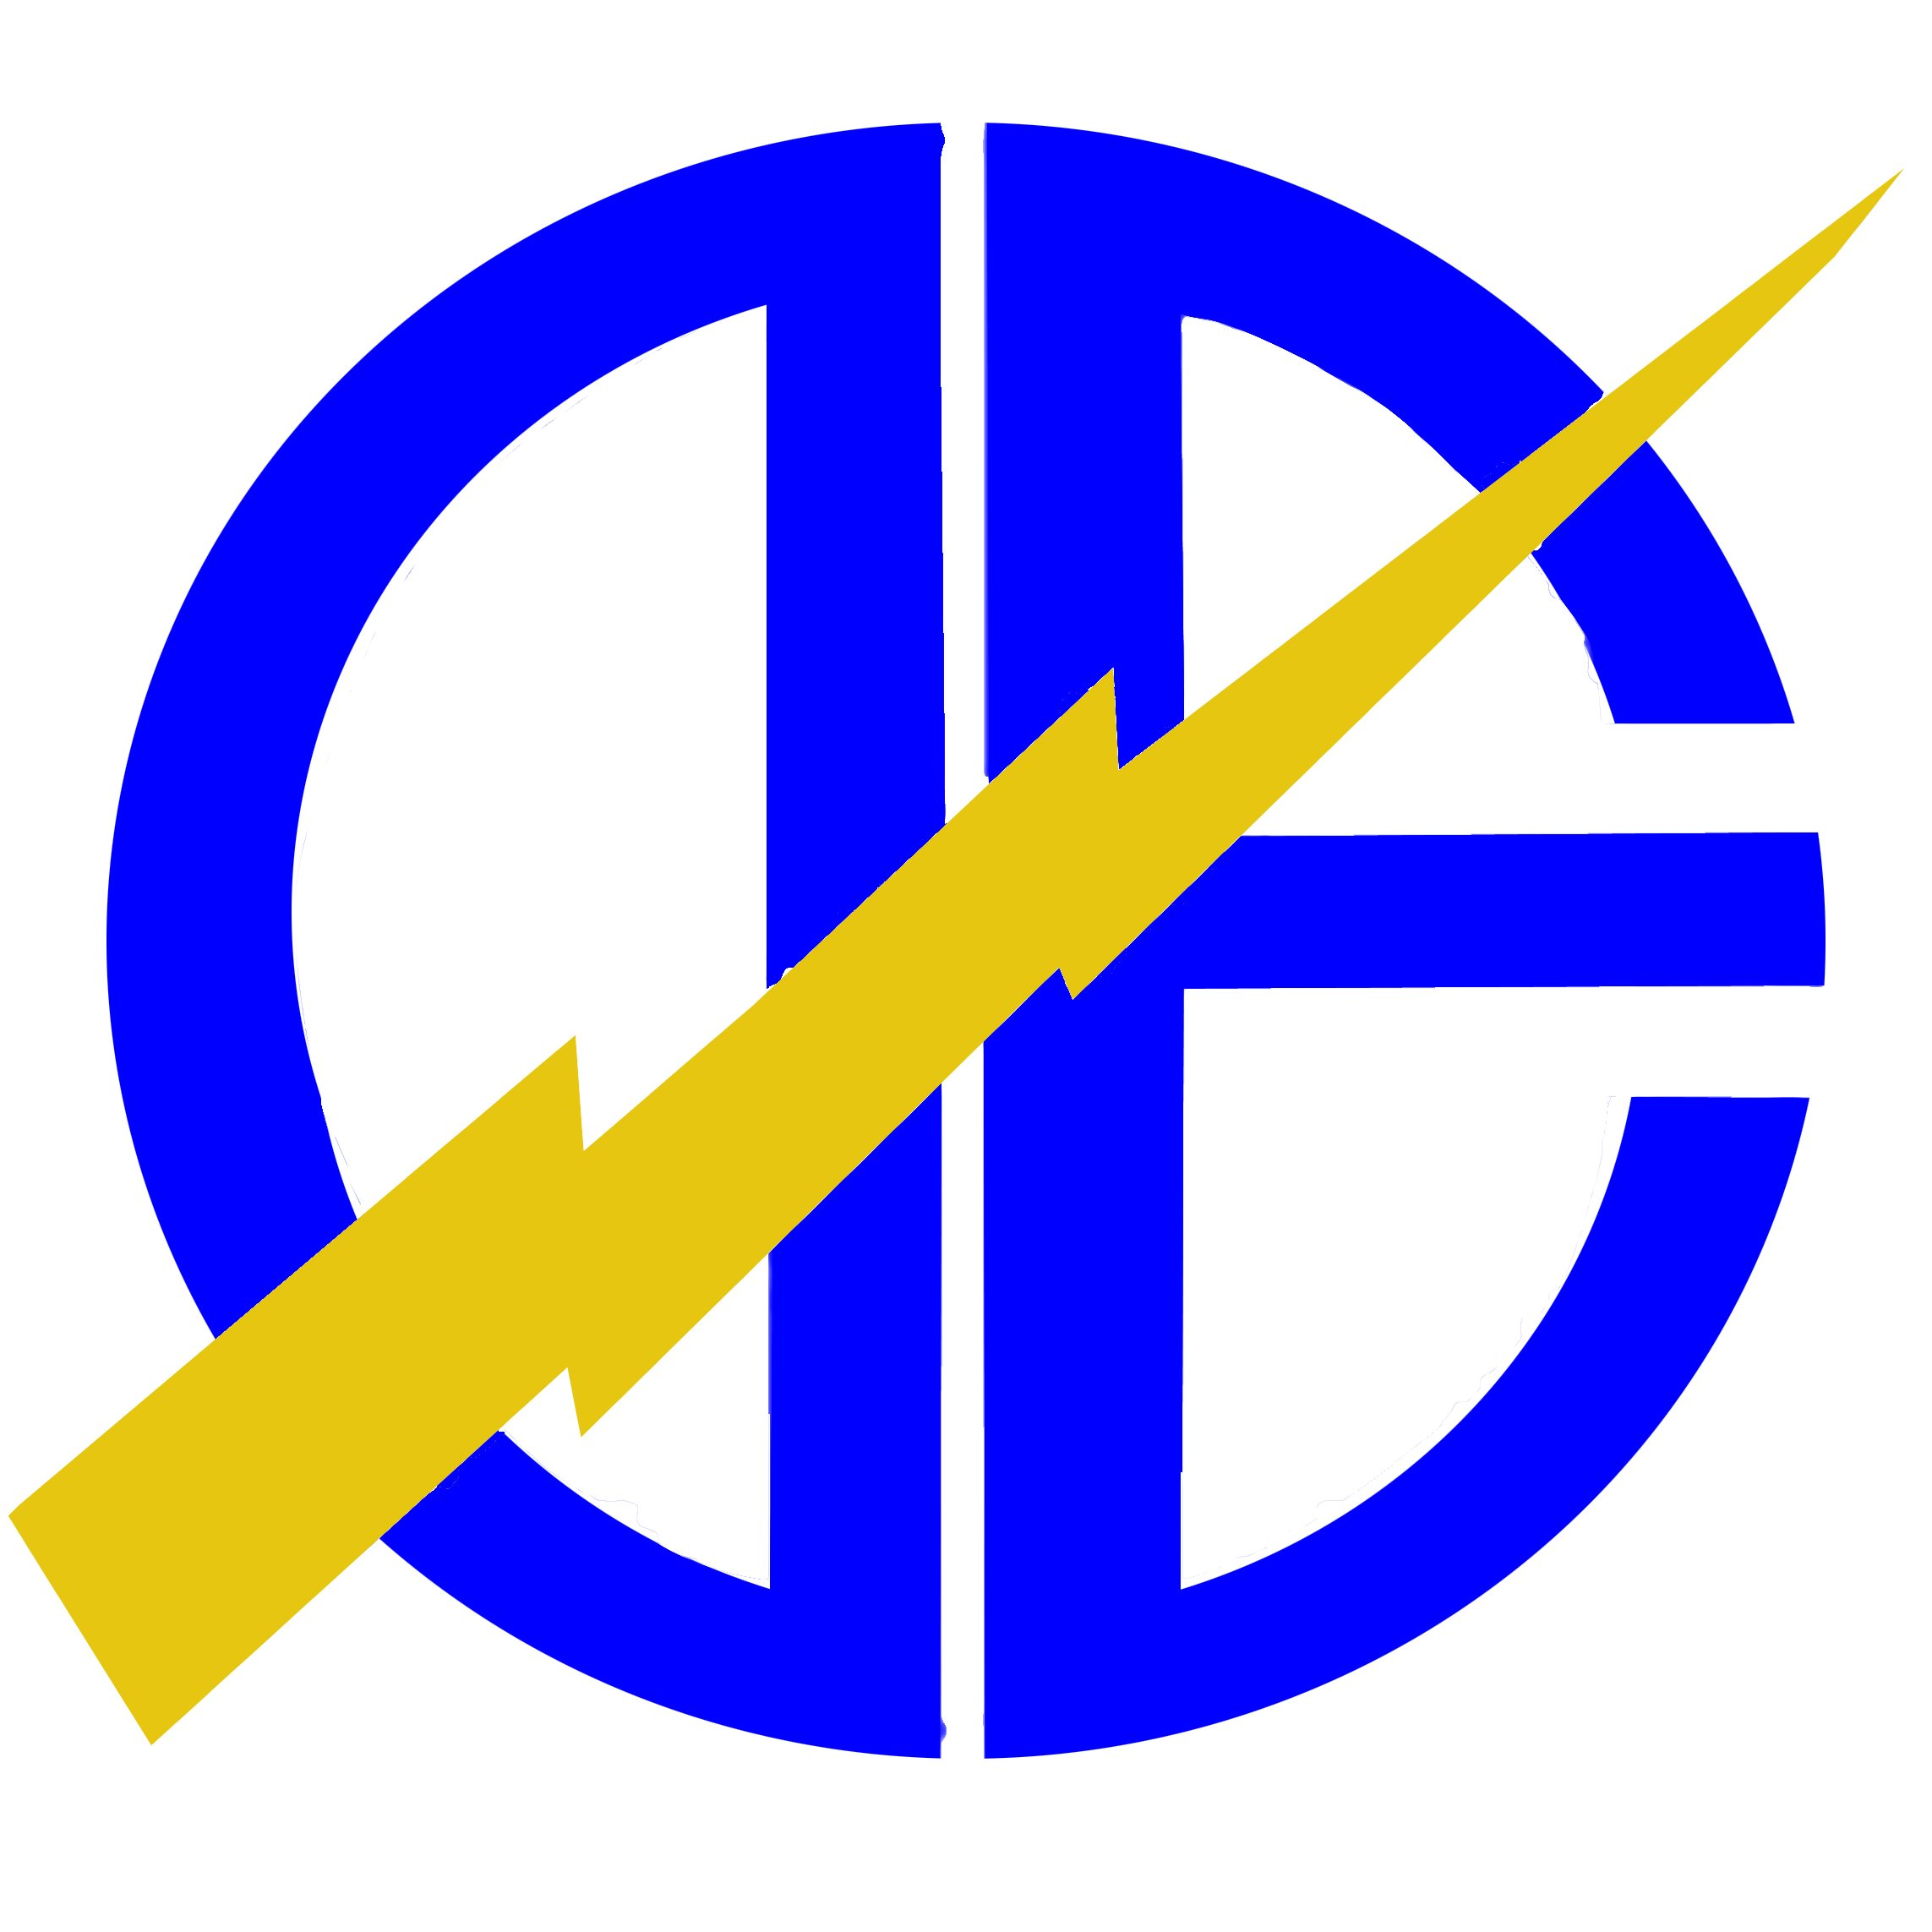 DIRECT ELECTRIX EQUIPMENT CORPORATION